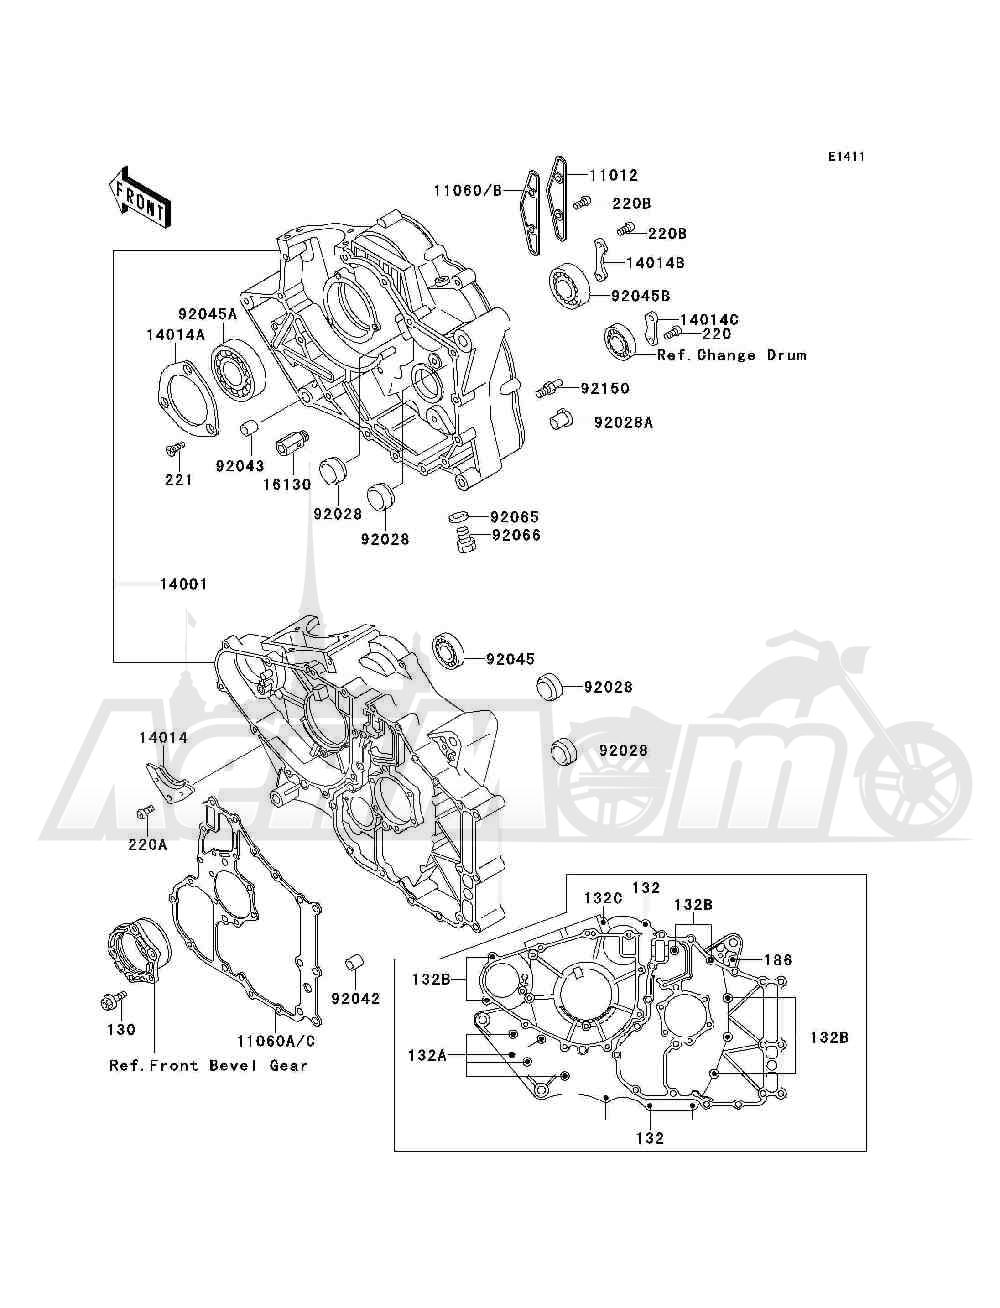 Запчасти для Квадроцикла Kawasaki 1993 BAYOU 300 4X4 (KLF300-C5) Раздел: CRANKCASE | картер